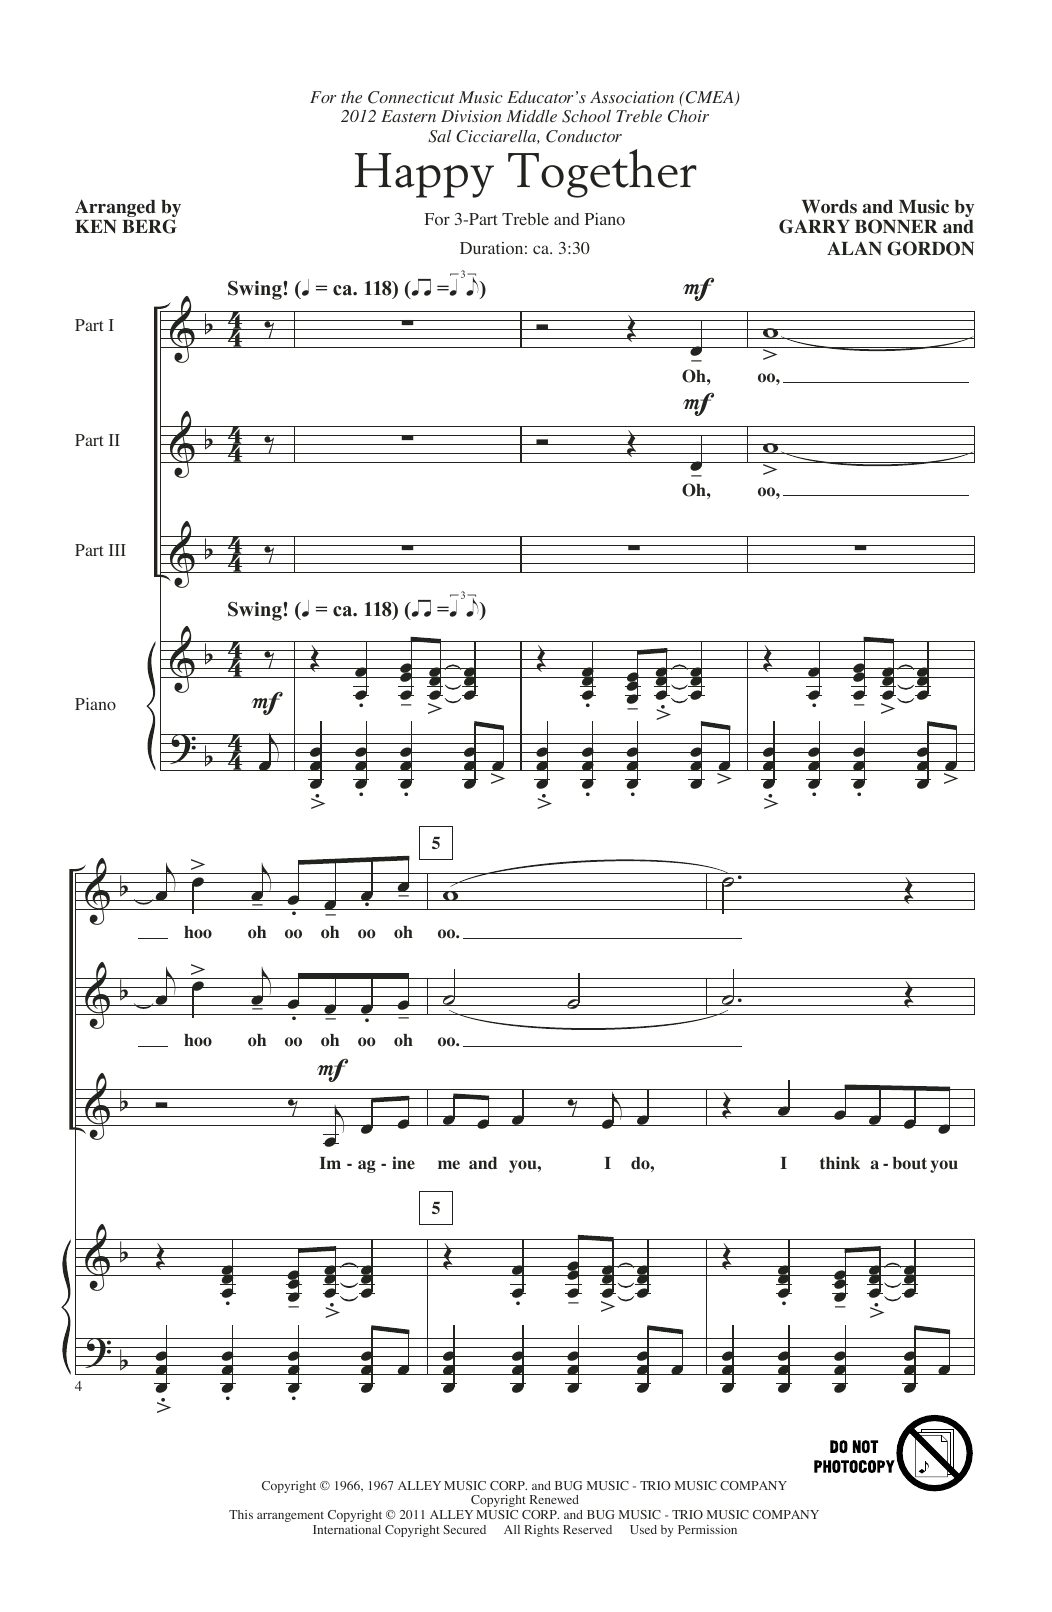 Happy Together (arr. Ken Berg) (3-Part Treble Choir)